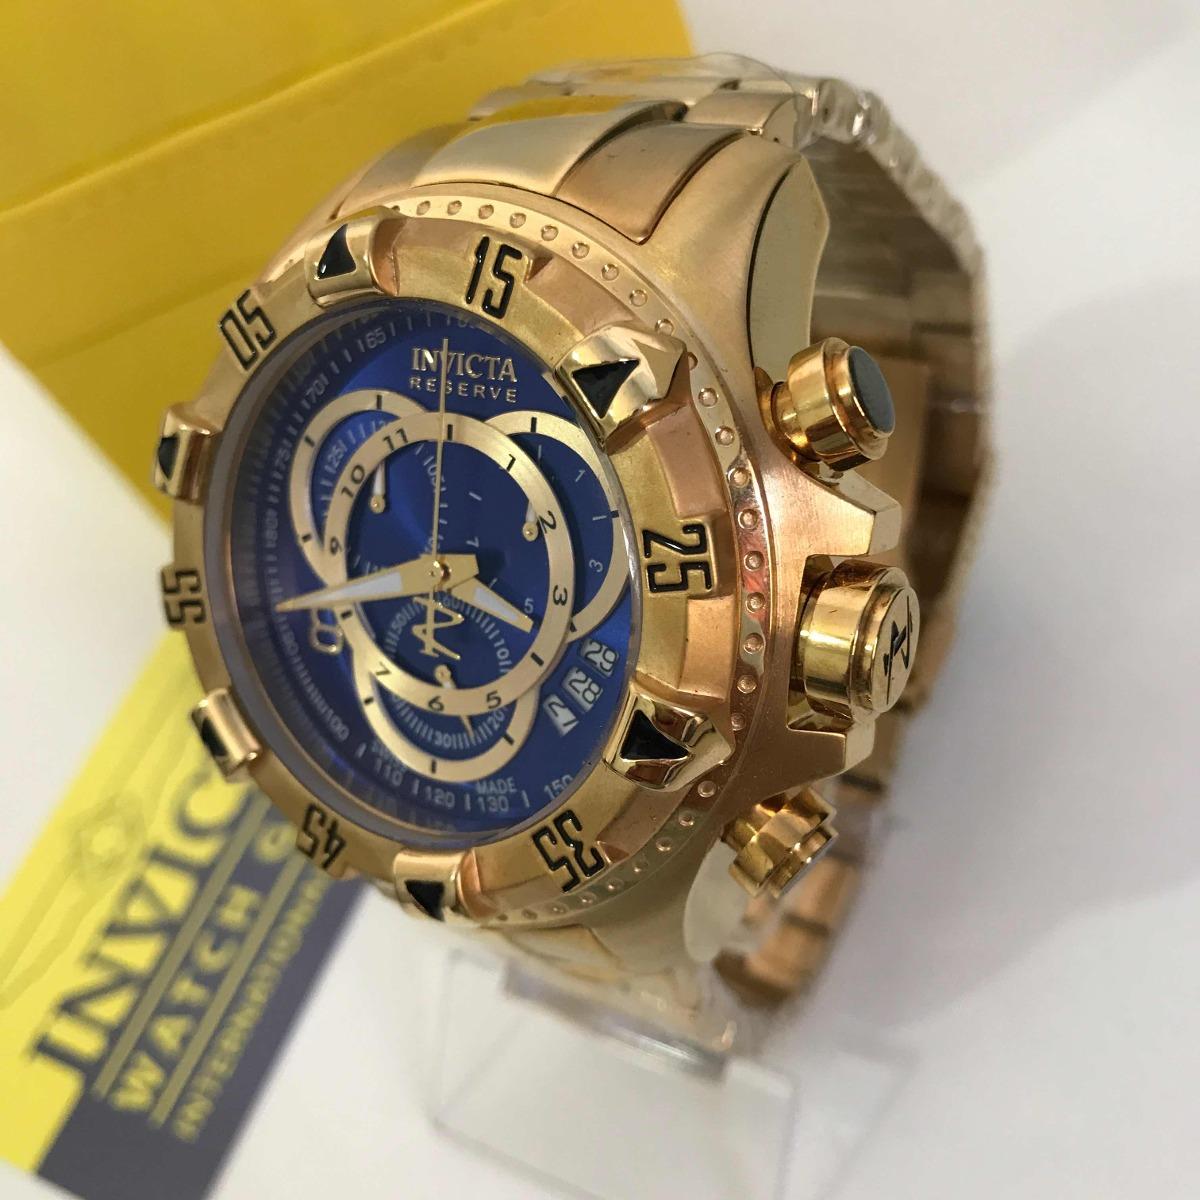 dd06ac77a9b relógio invicta 6469 excursion dourado fundo azul. Carregando zoom.